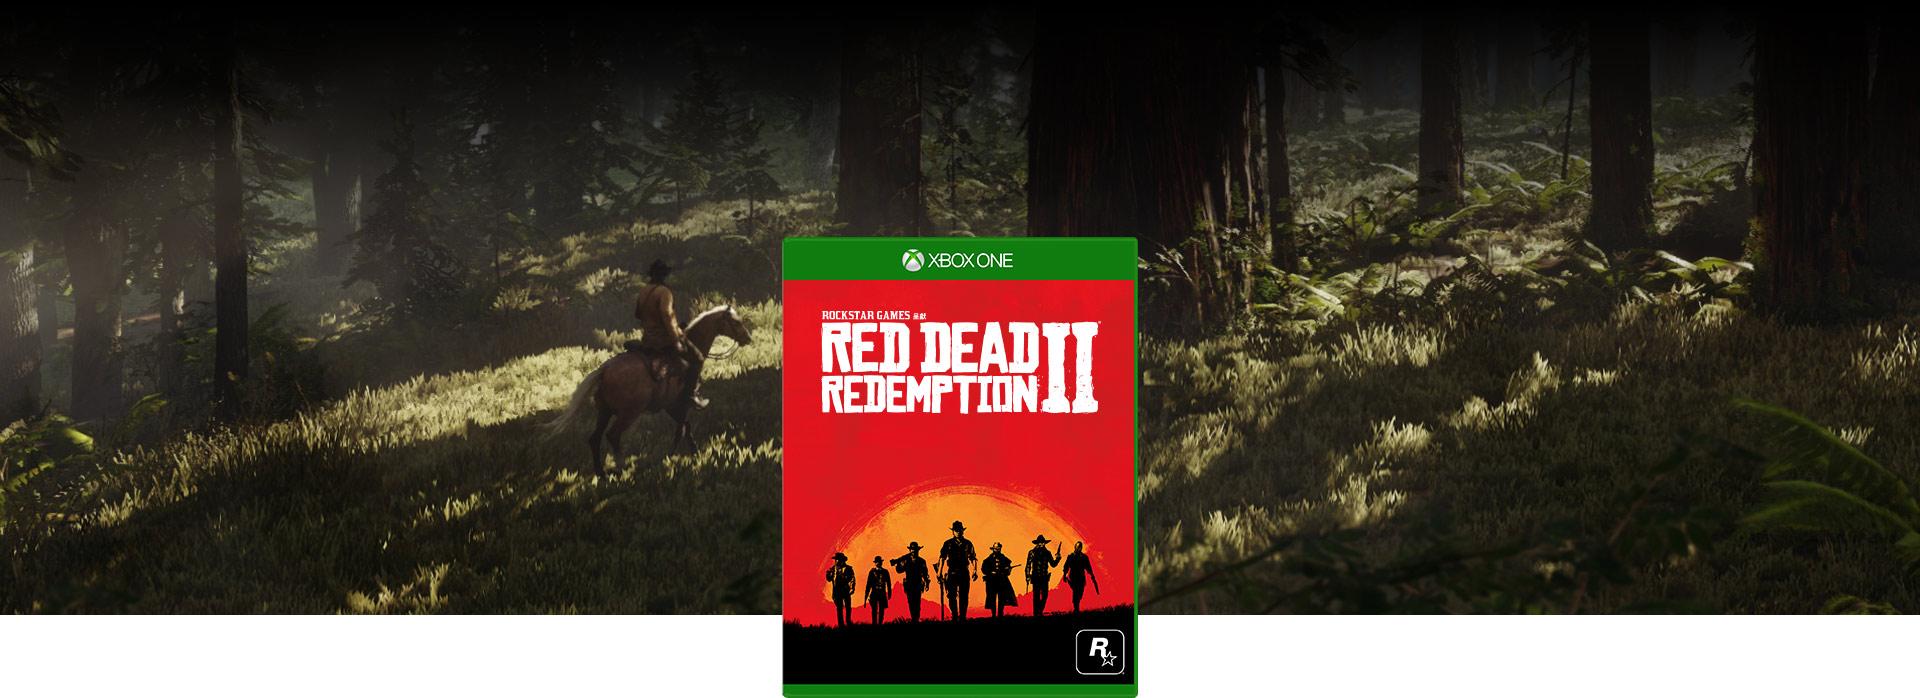 Red Dead Redemption 2 包裝圖